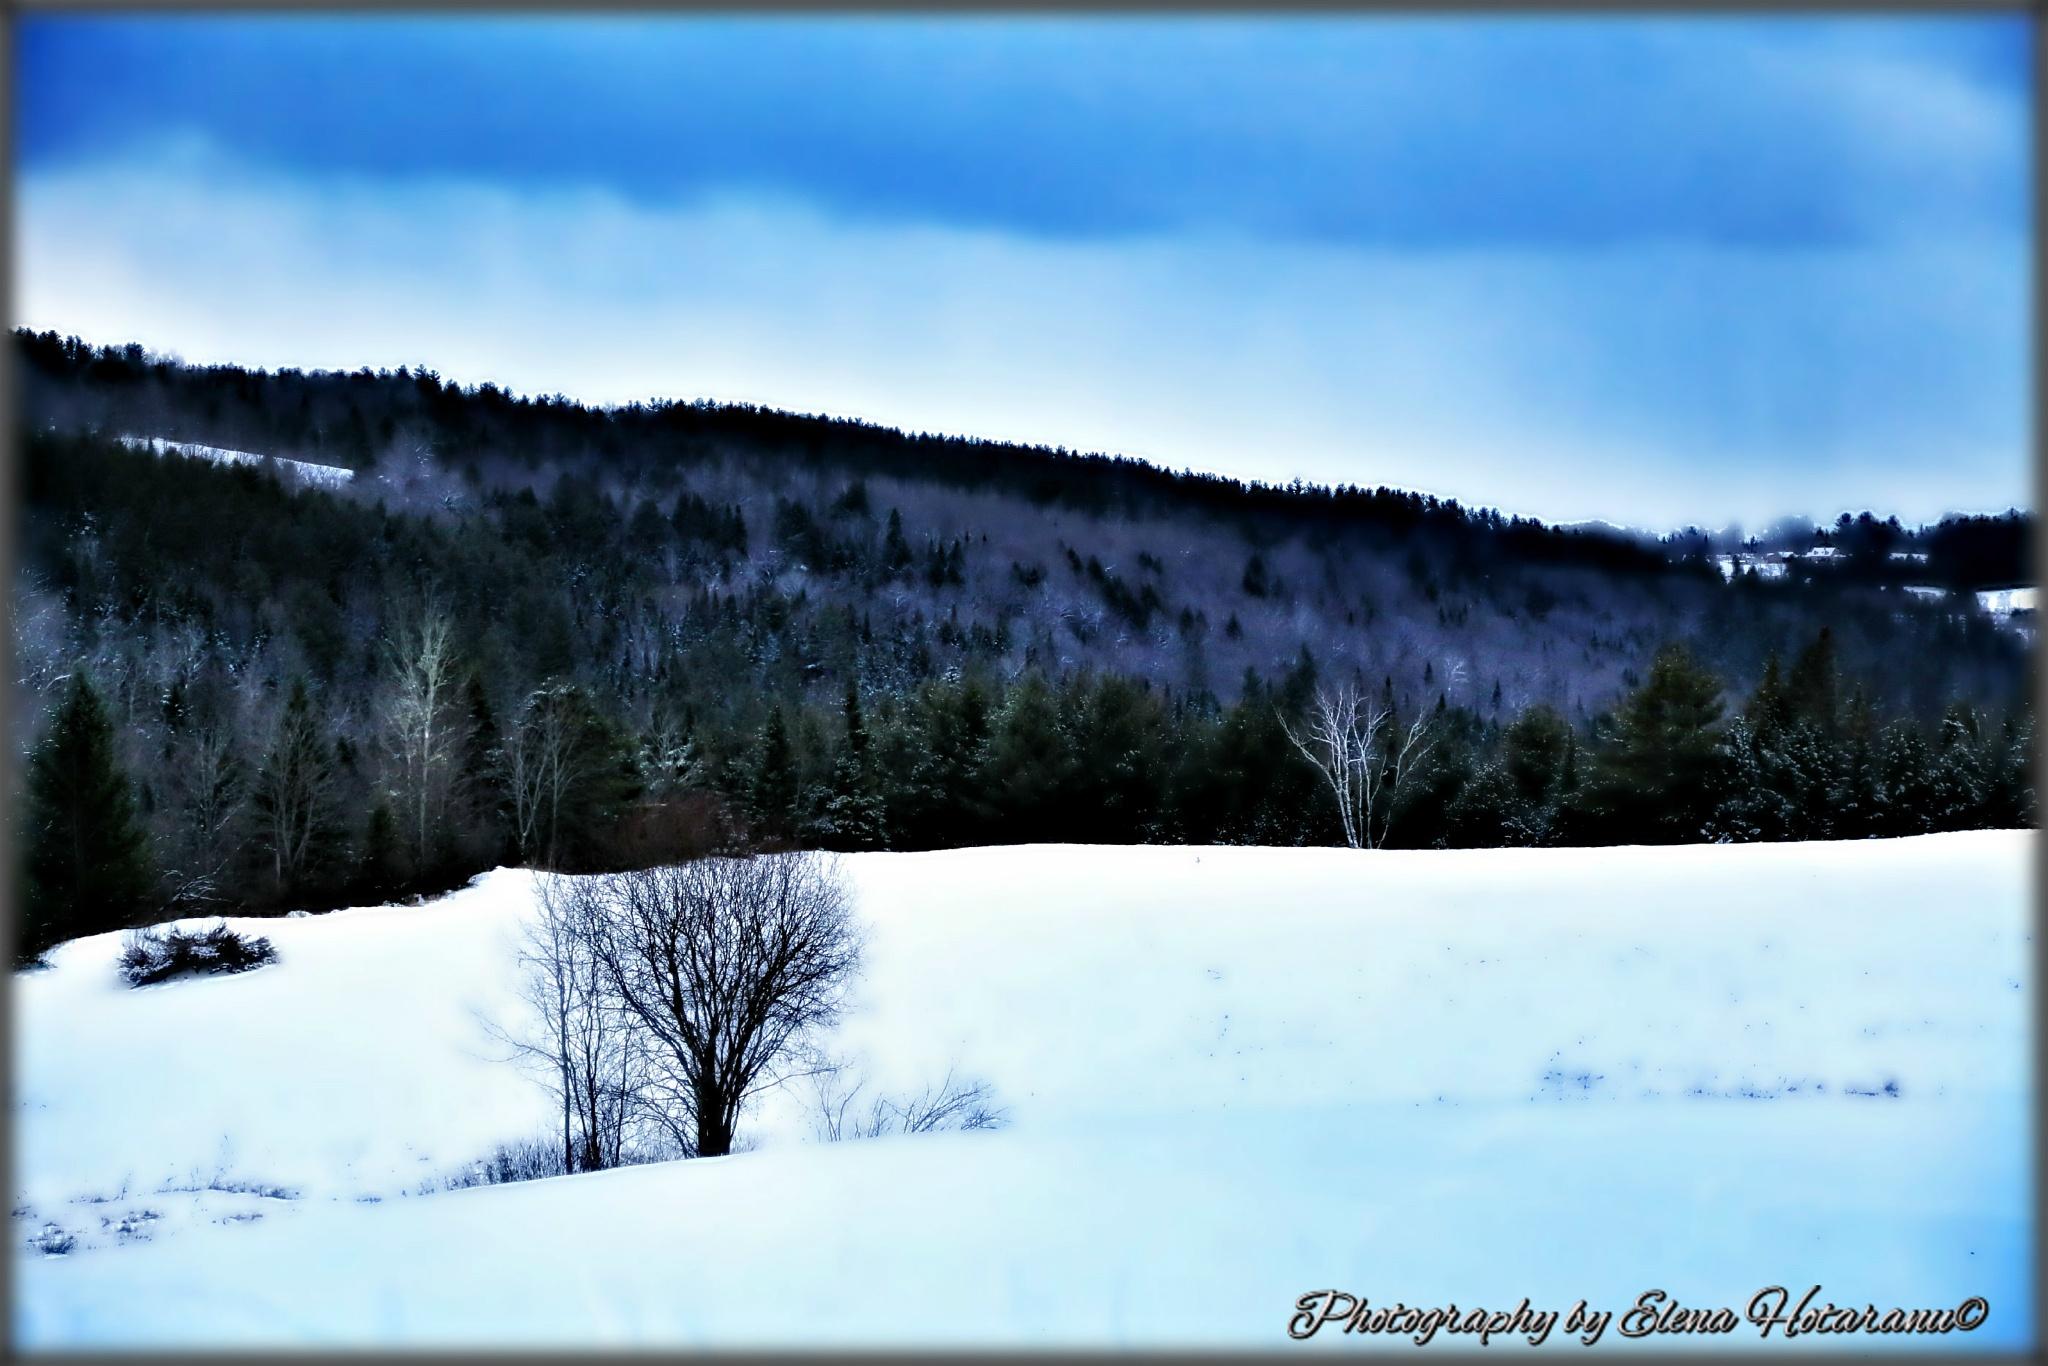 Winter in Vermont by Elena Hotaranu